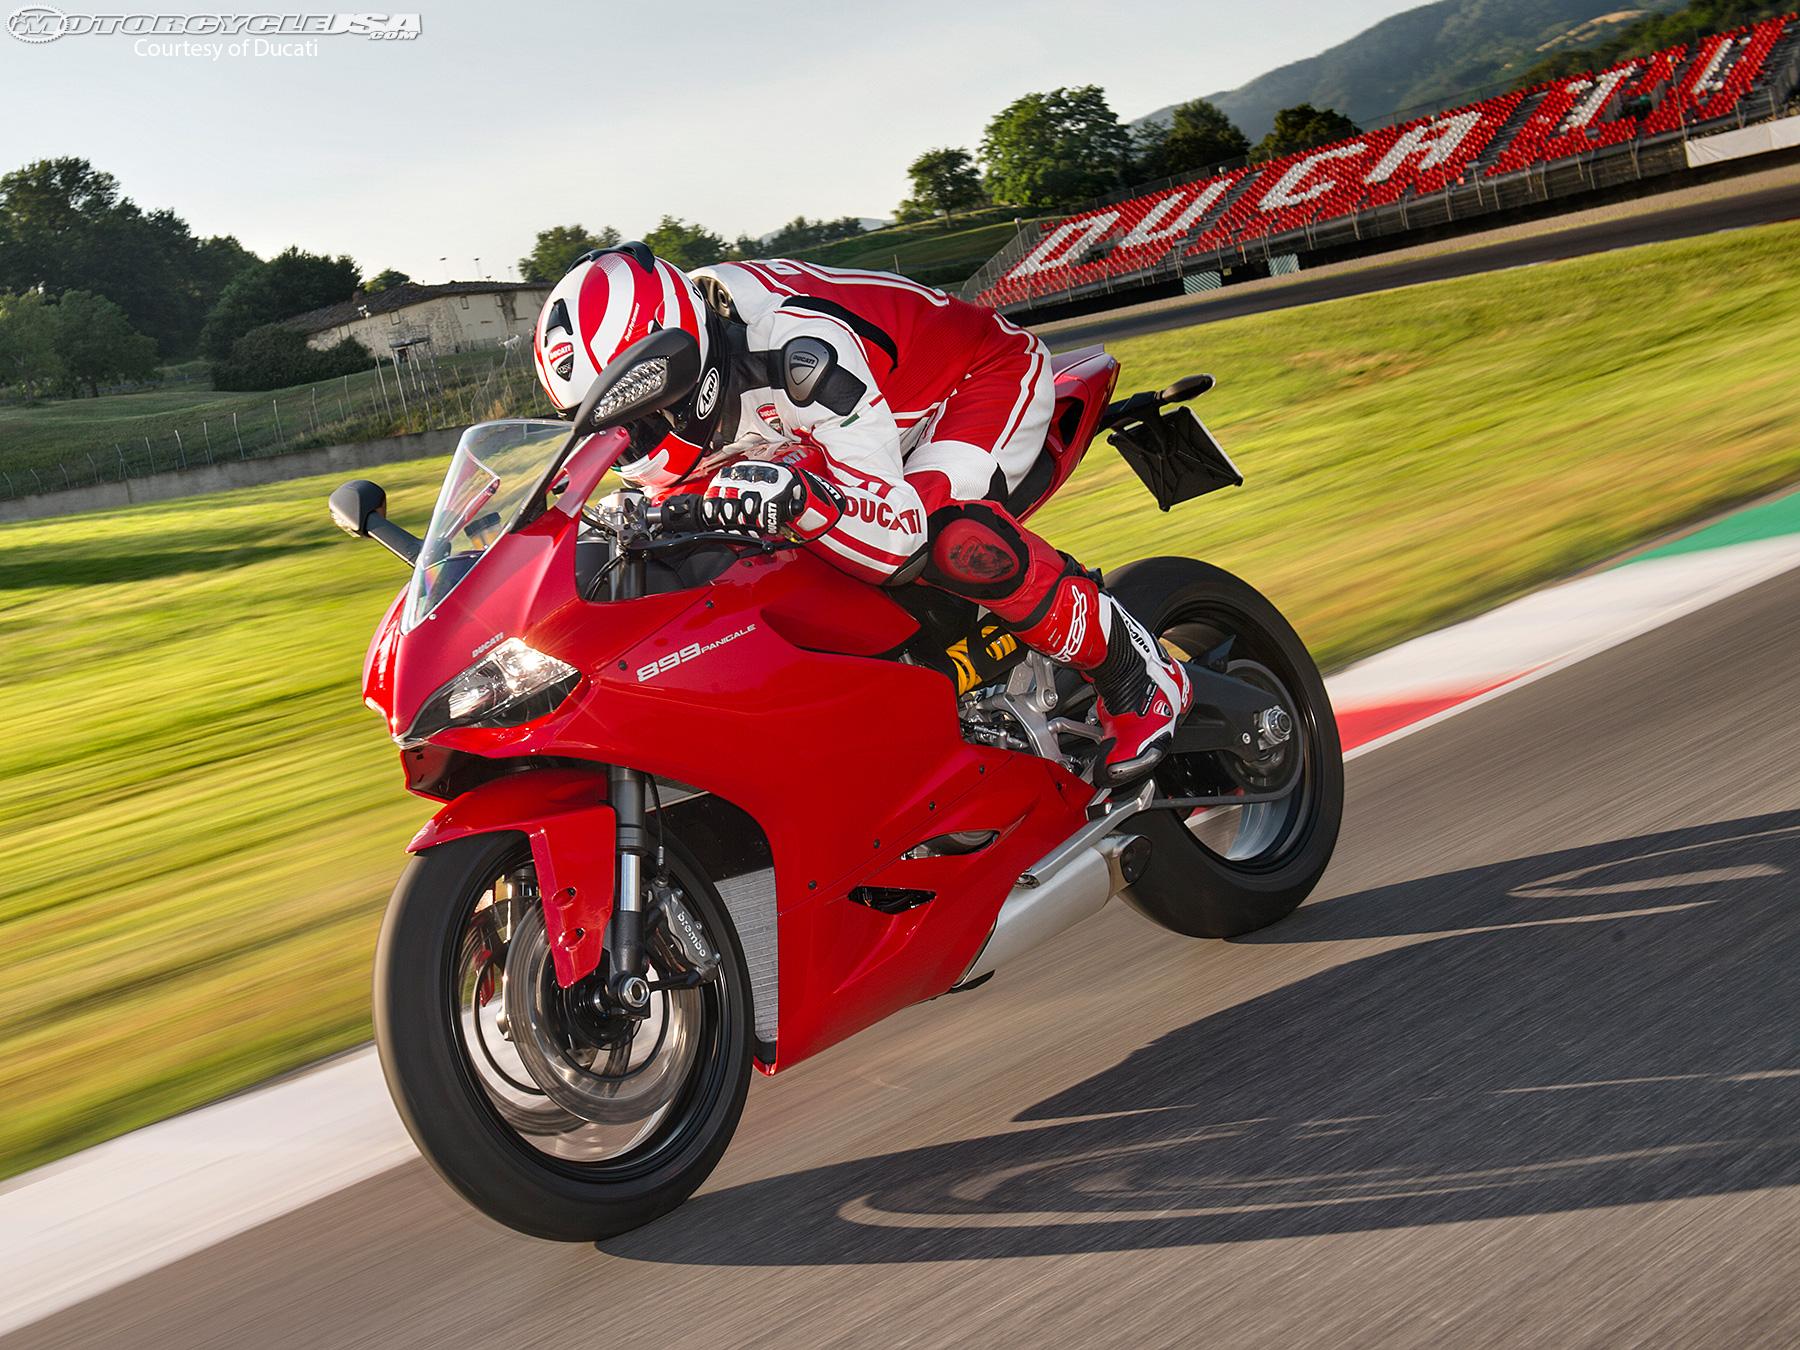 Ducati Panigale 899 Wallpaper 2014 Ducati 899 Panigale Pop 1800x1350